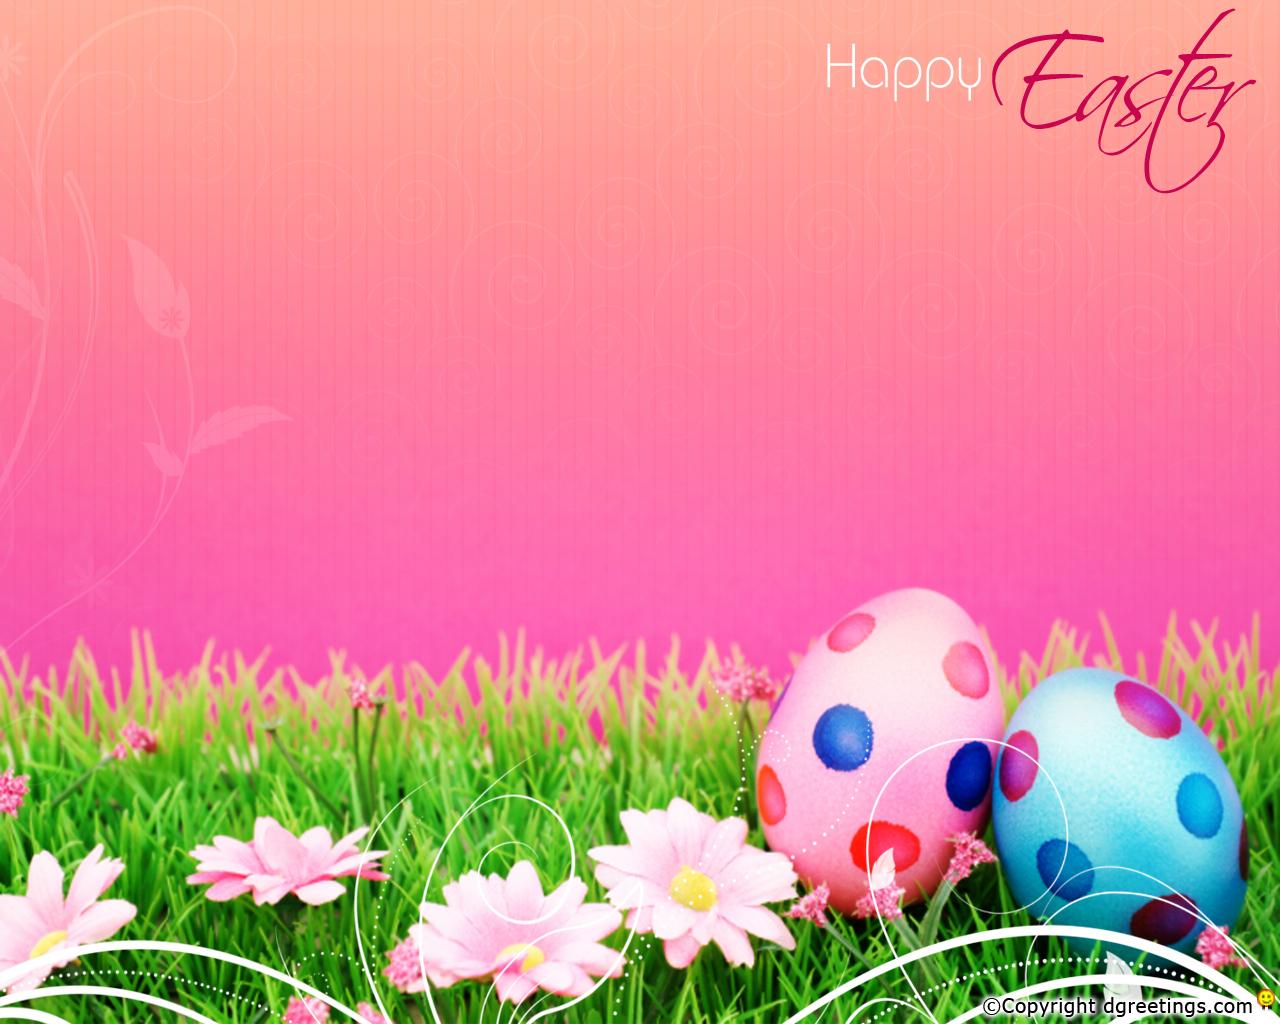 Easter Wallpaper 1 1280x1024